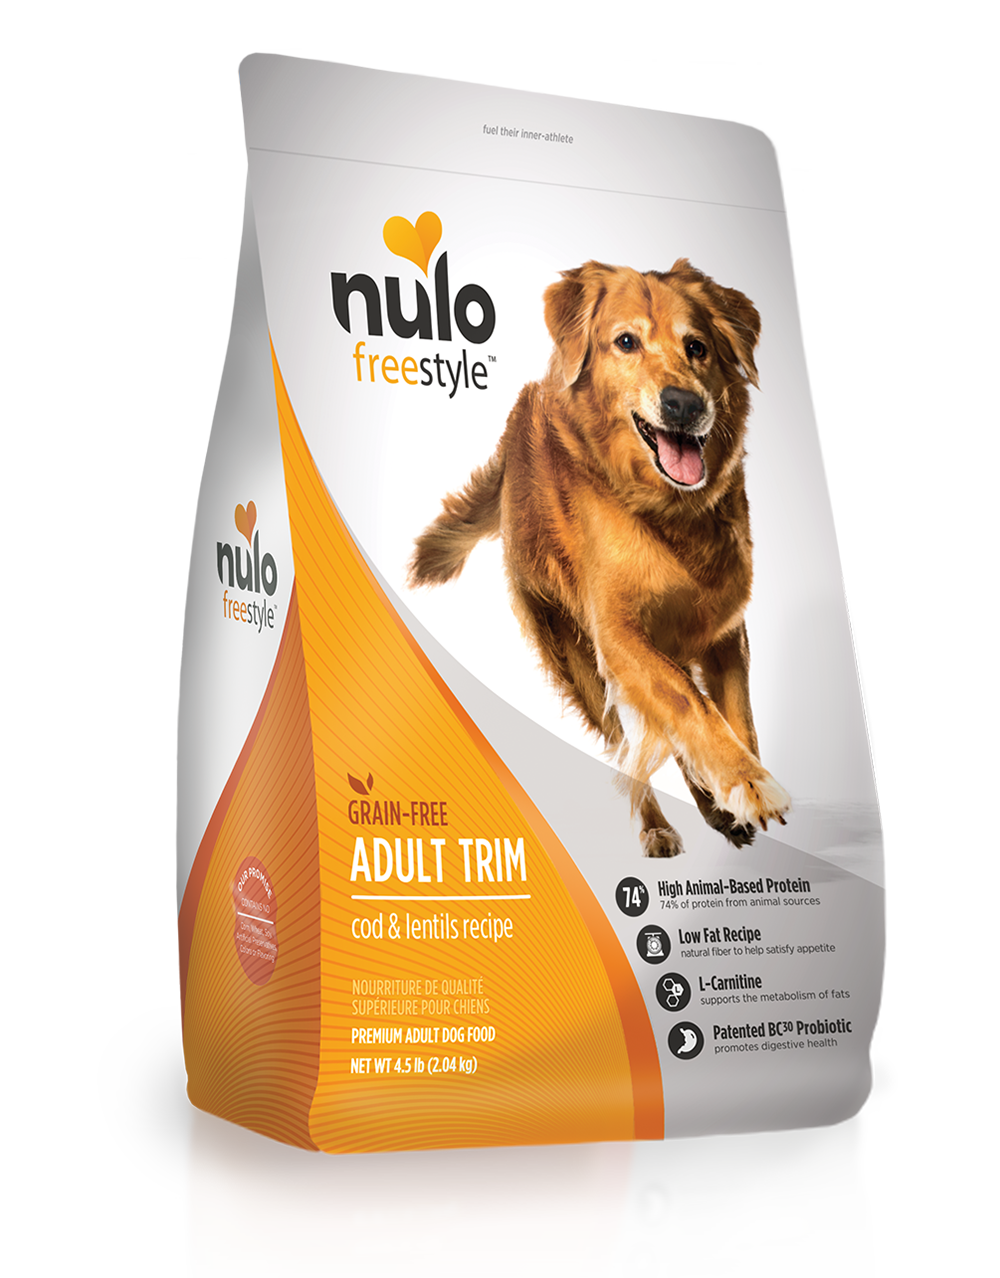 Nulo Pet Food